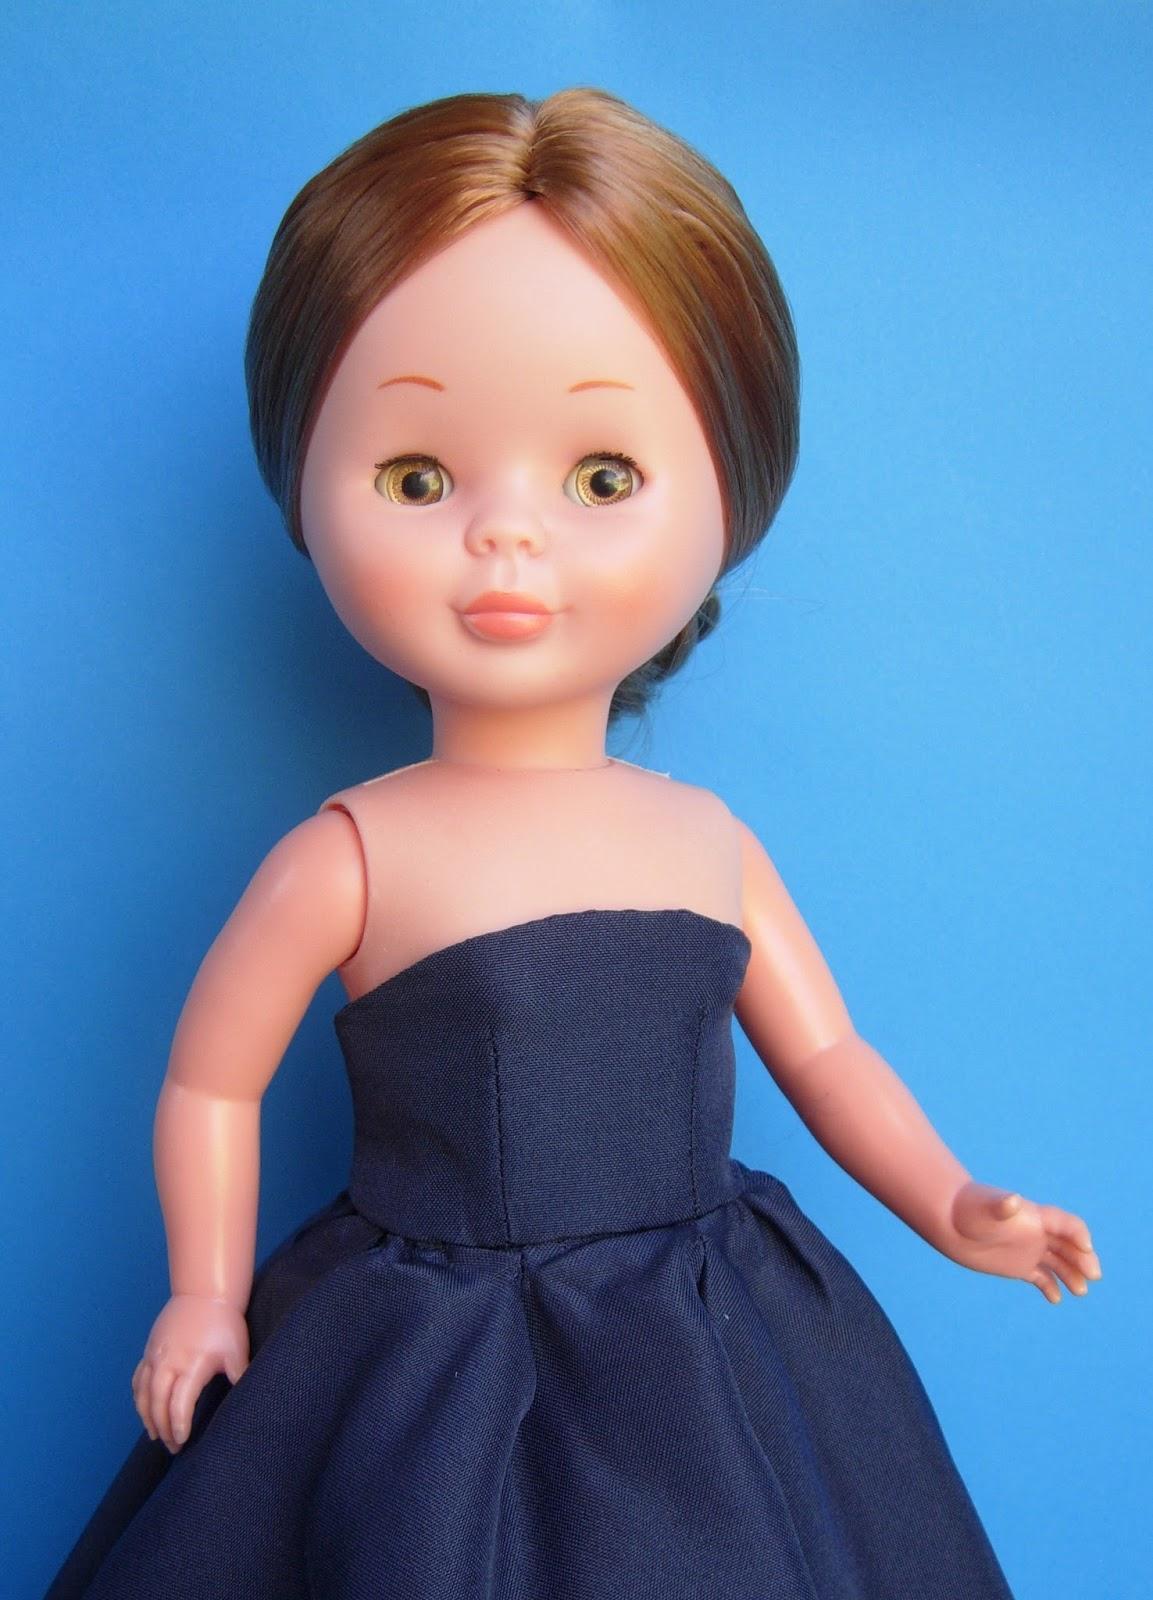 Vestido azul da lomba larga - 5 10